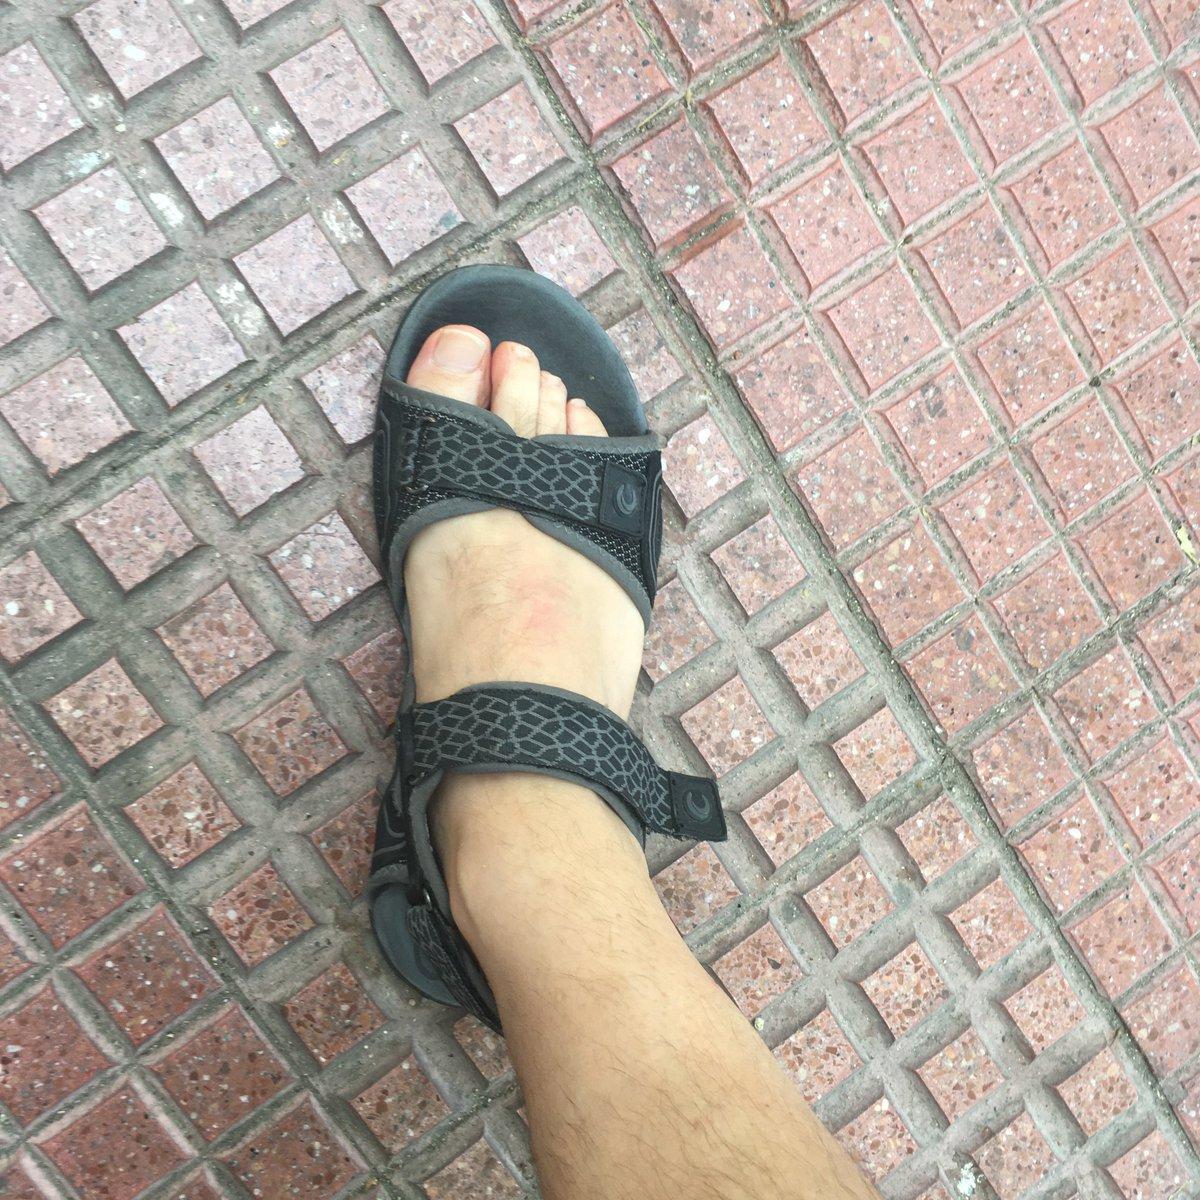 Media Tweets Luis Media By Tweets By TorijaluistorijaTwitter Luis tQdsrh